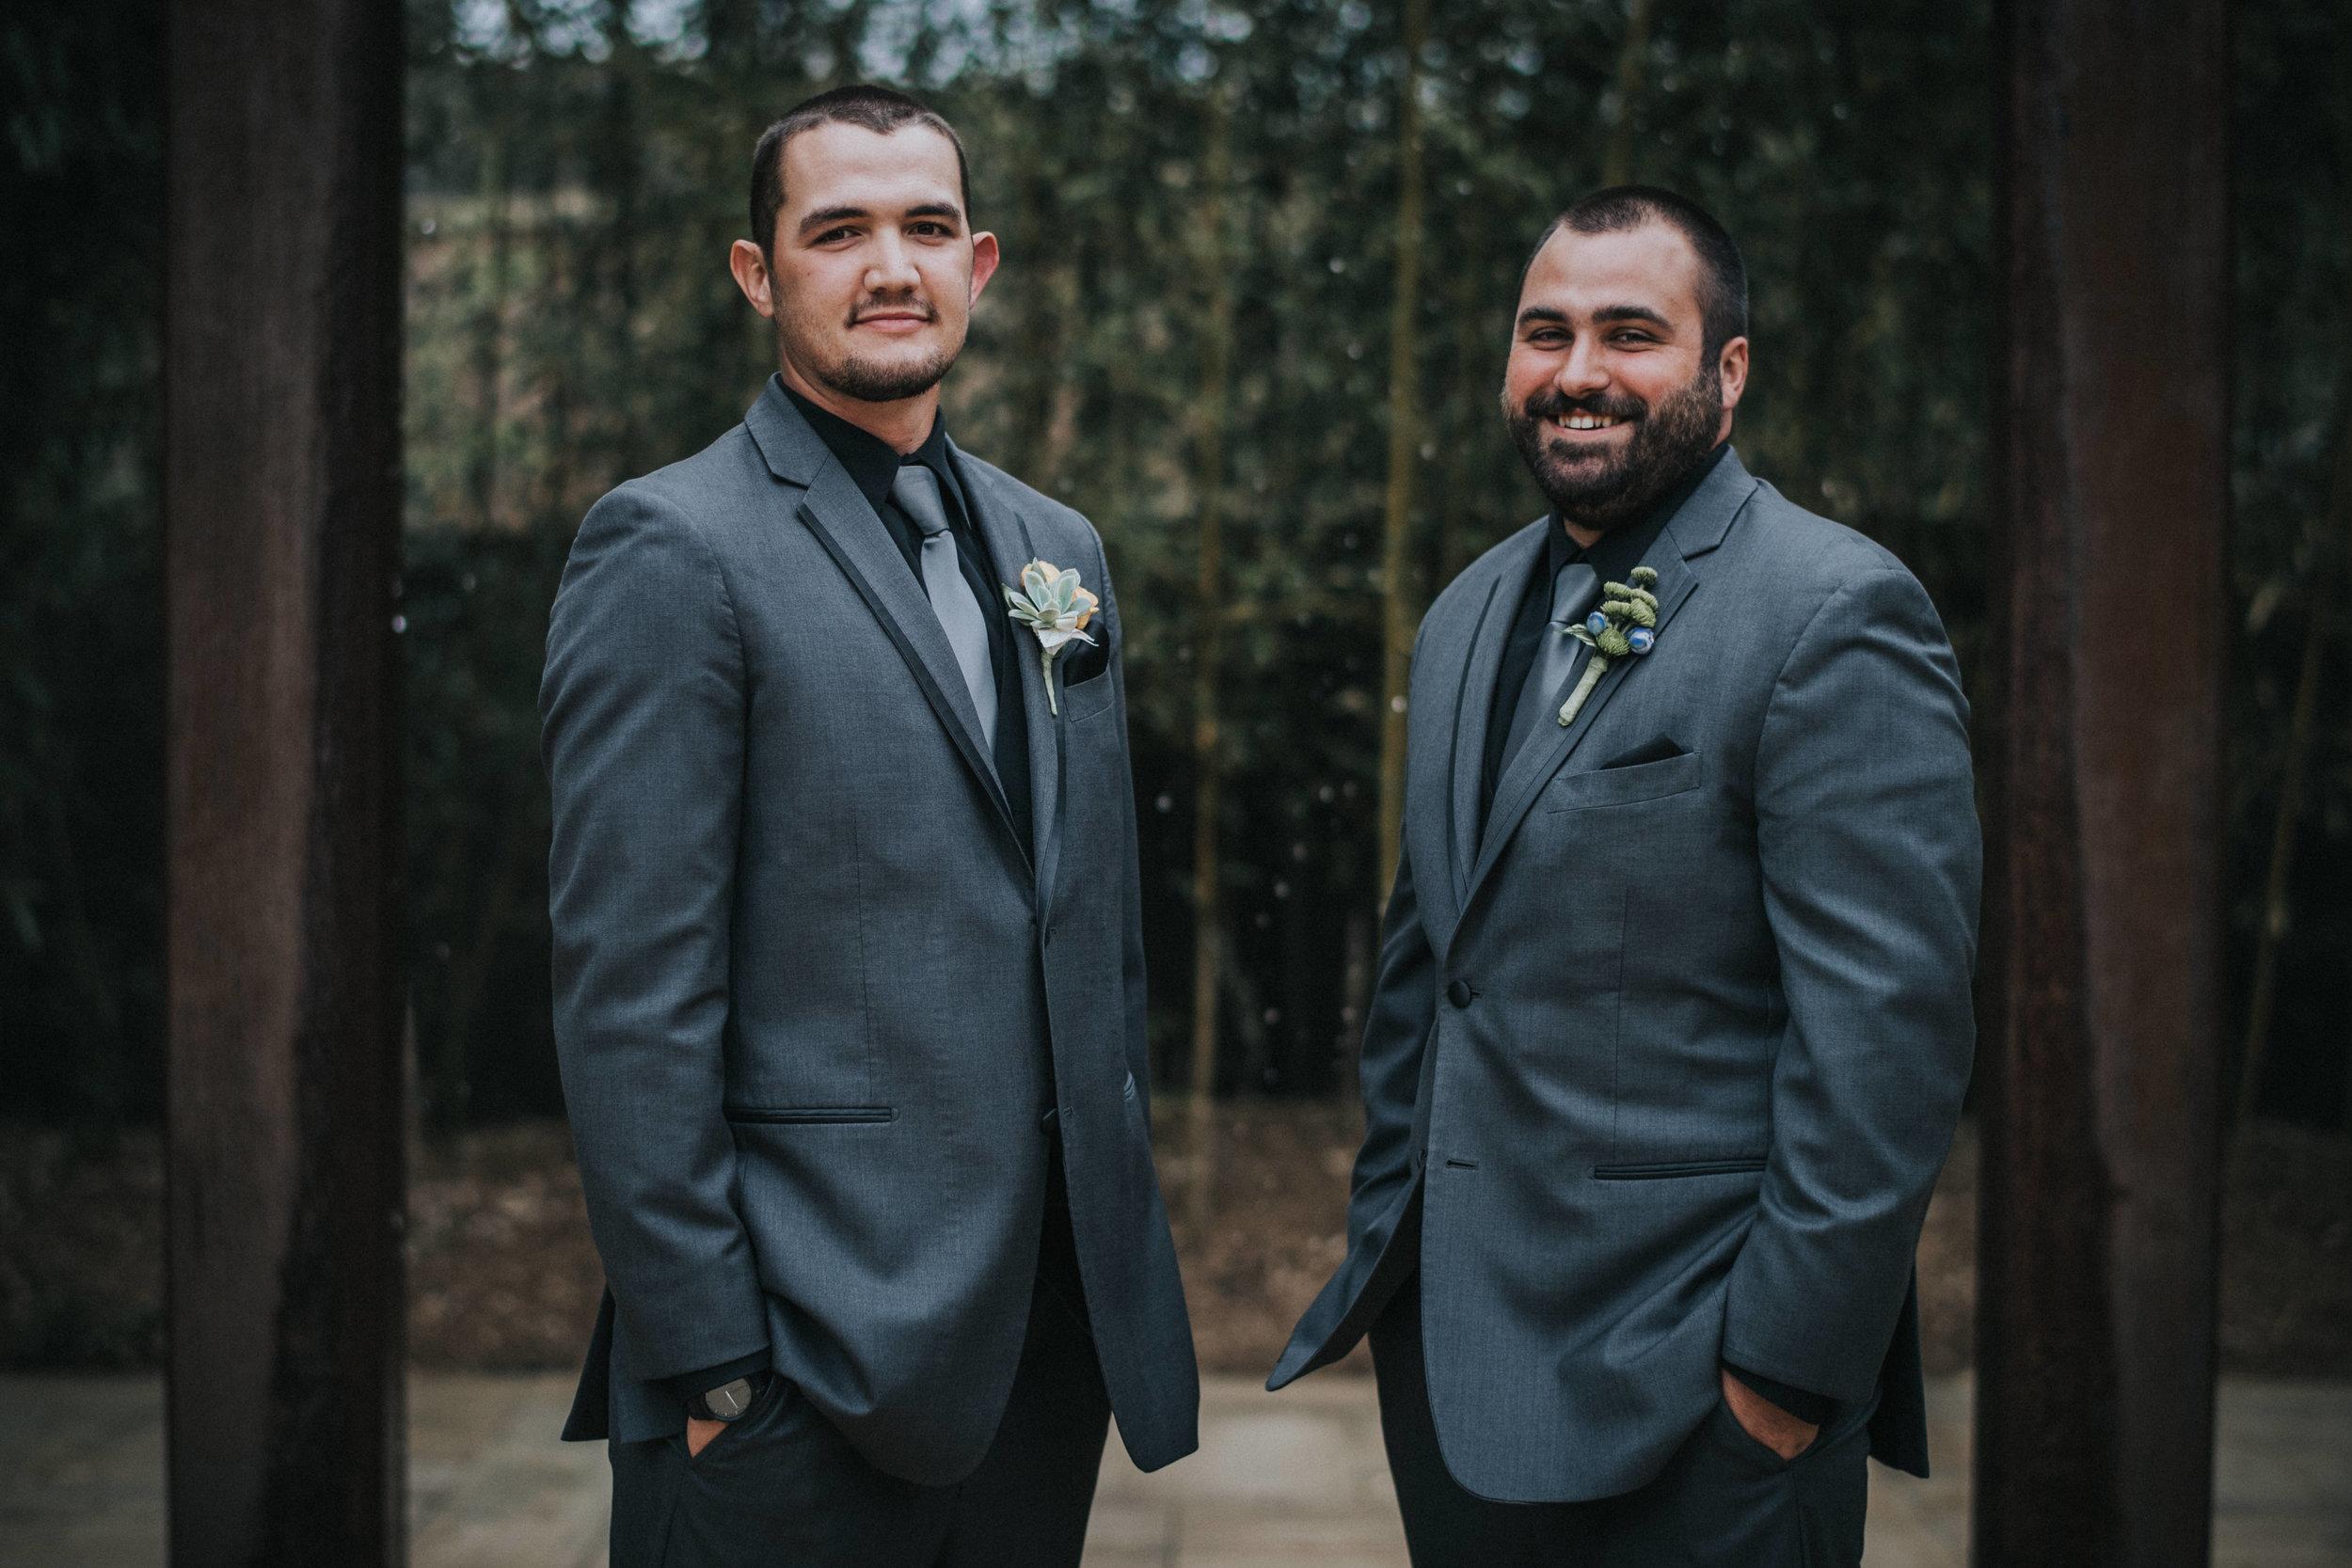 New-Jersey-Wedding-Photographer-Megan&Nick-BridalParty-40.jpg